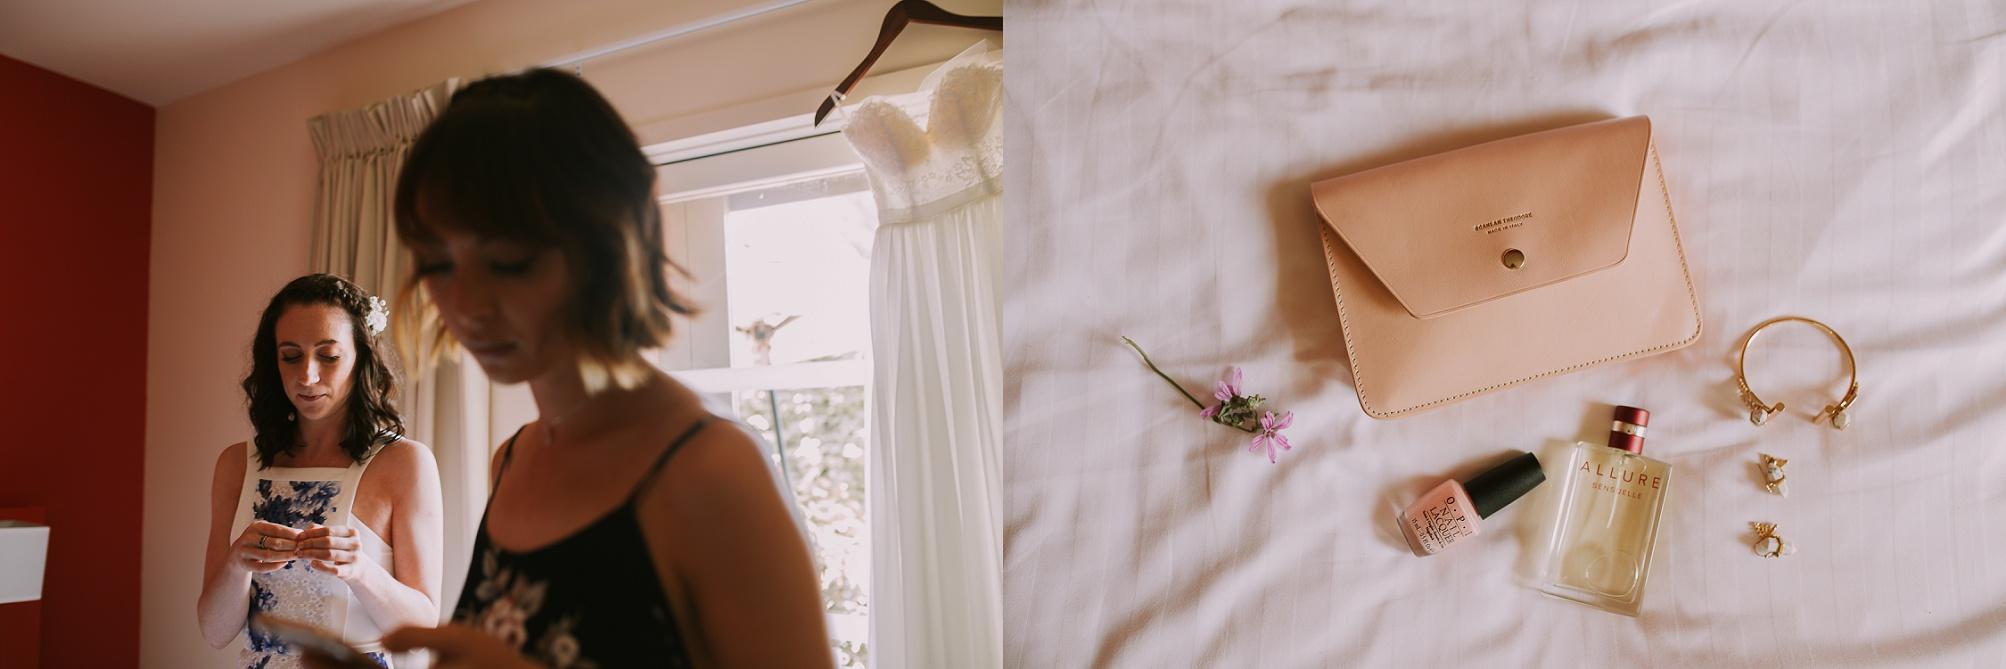 katerynaphotos-mariage-photographe-puyloubier-provence-aix-en-provence-sud-de-la-france_0334.jpg